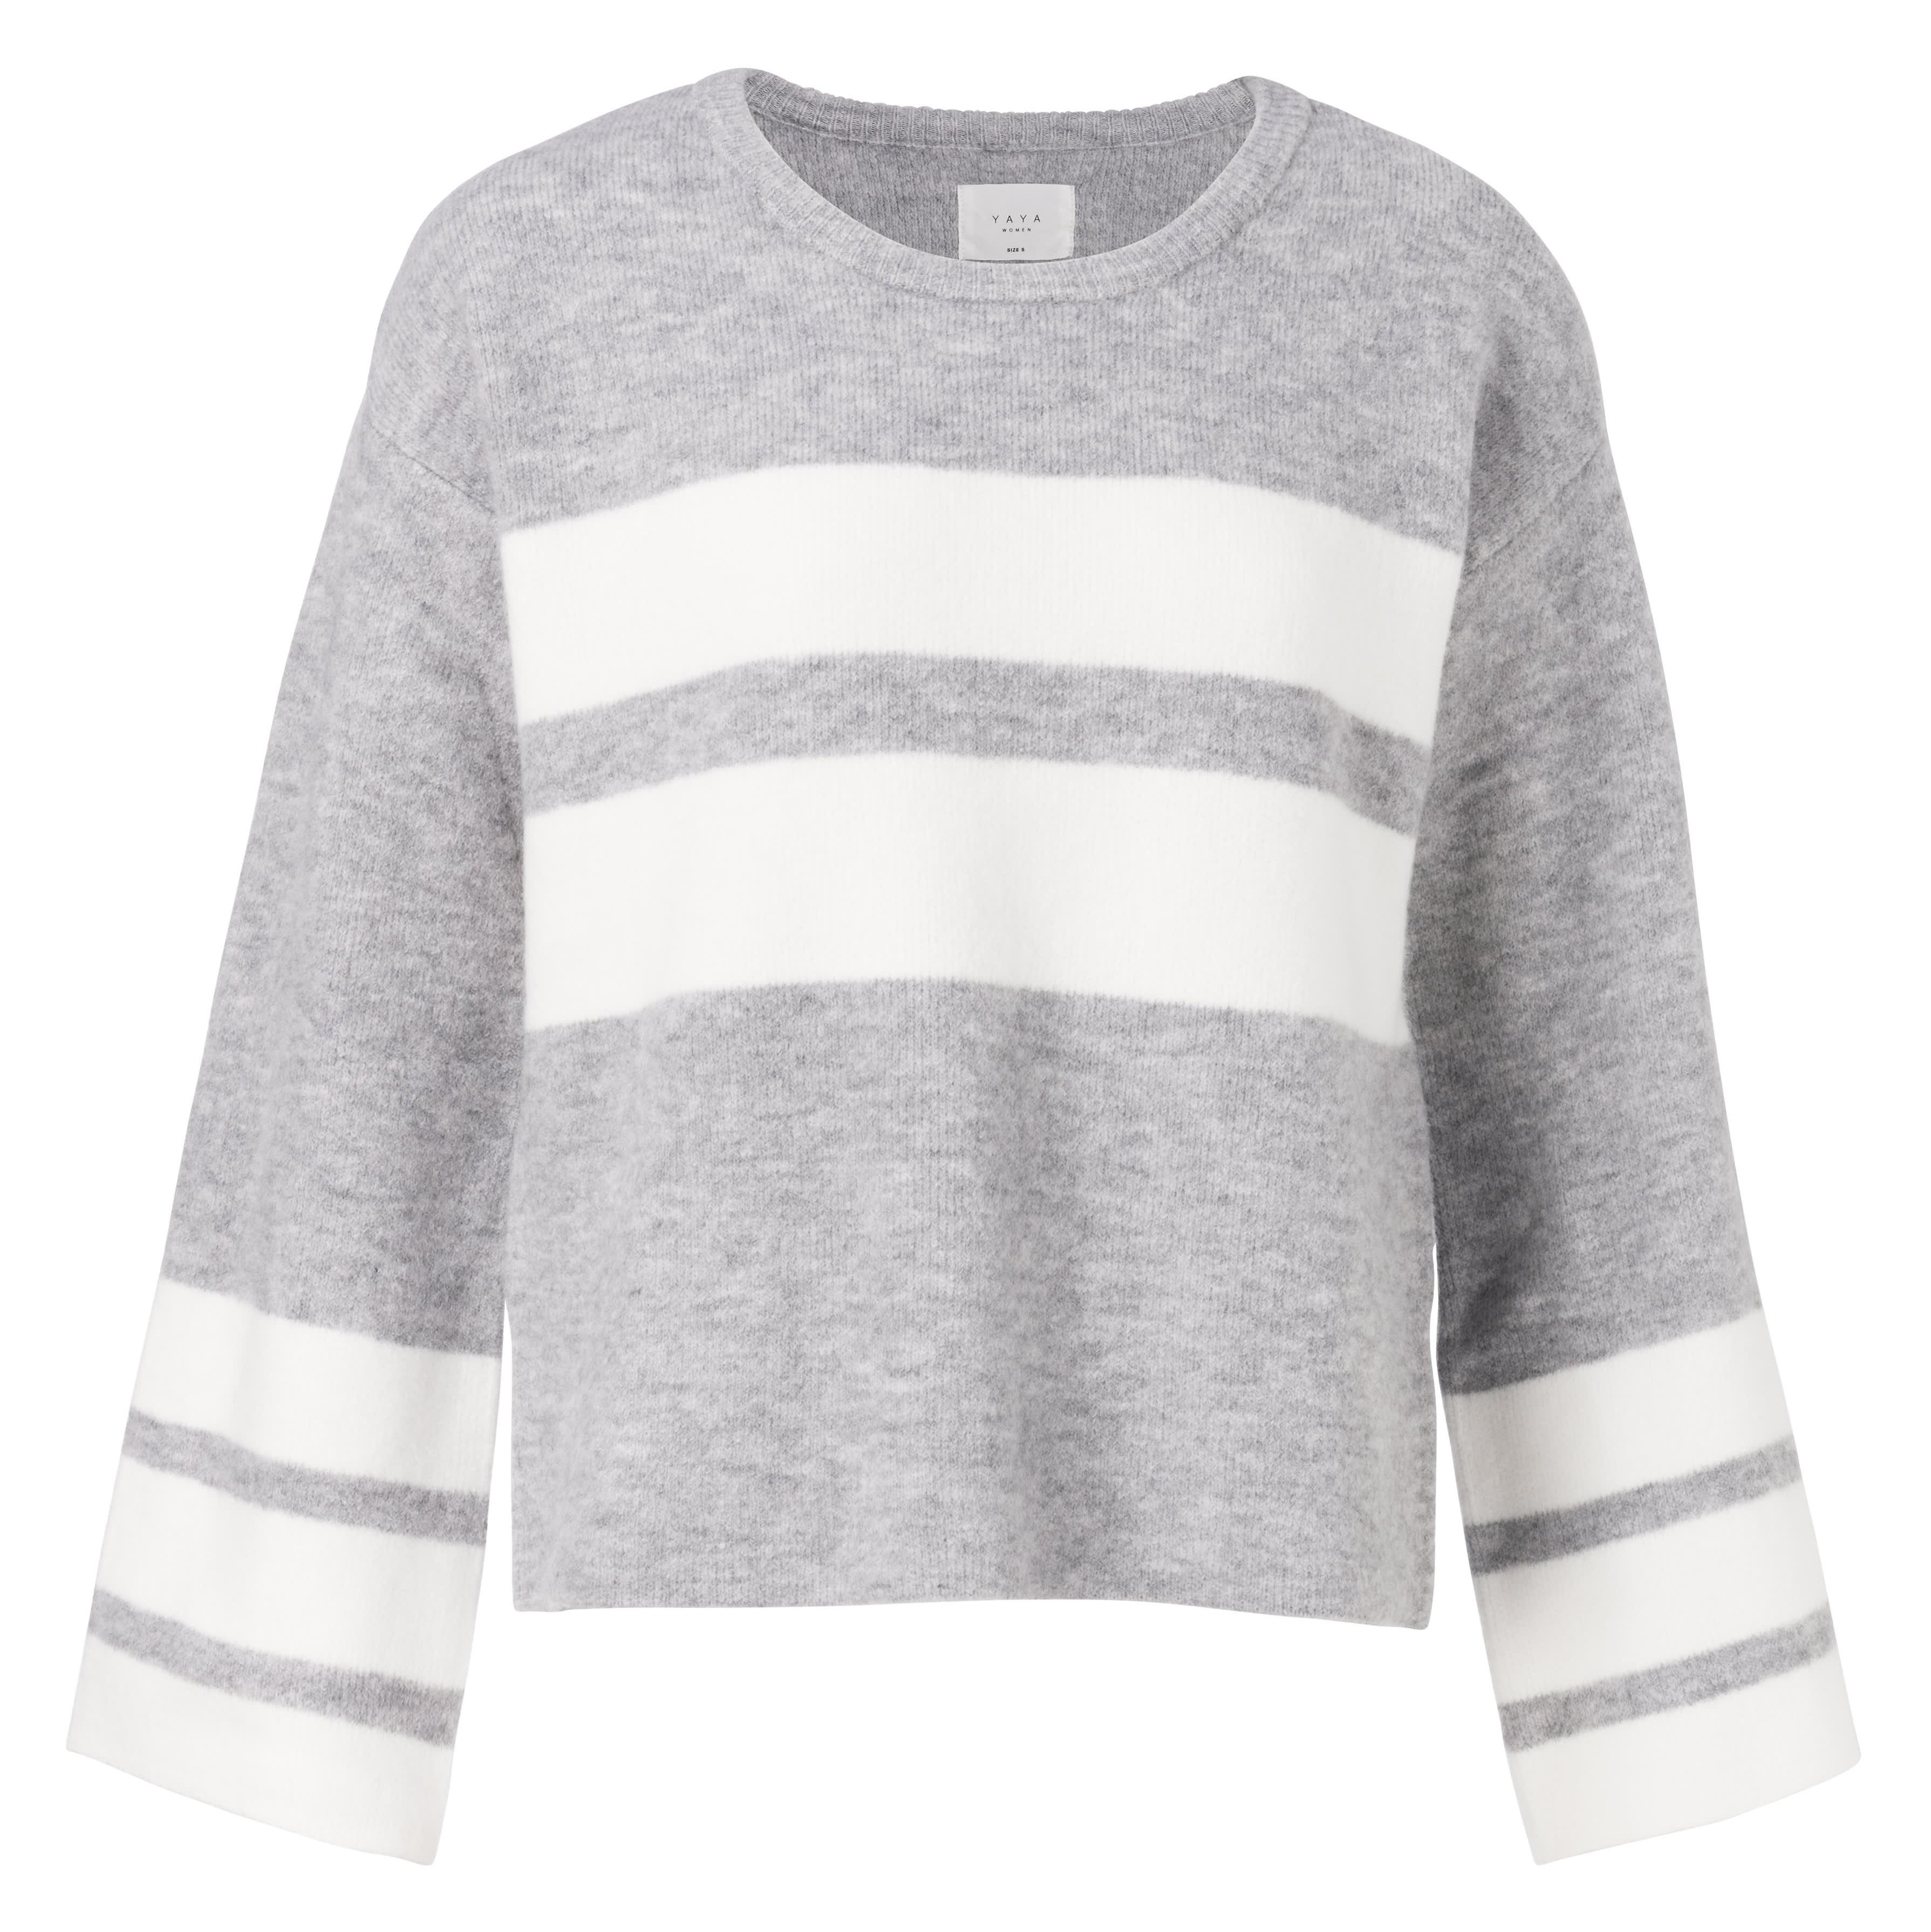 Yaya Grey & Winter White Kimono Sleeves Sweater